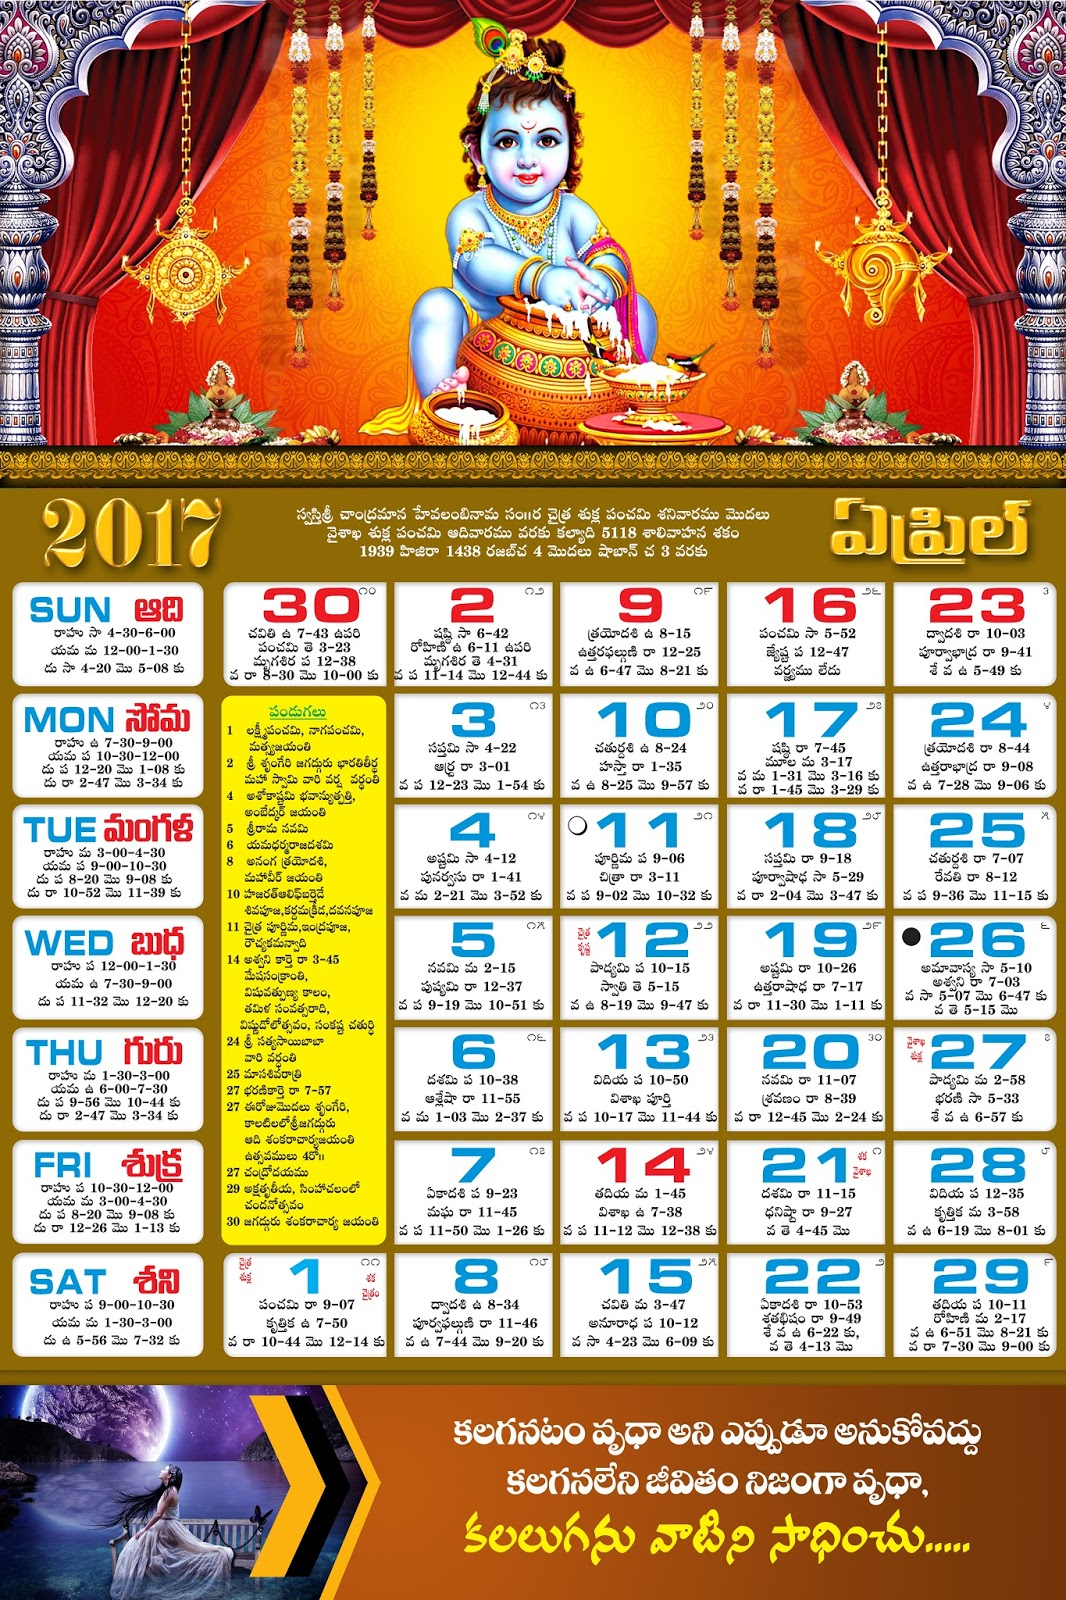 Venkatrama Telugu Calendar 1990